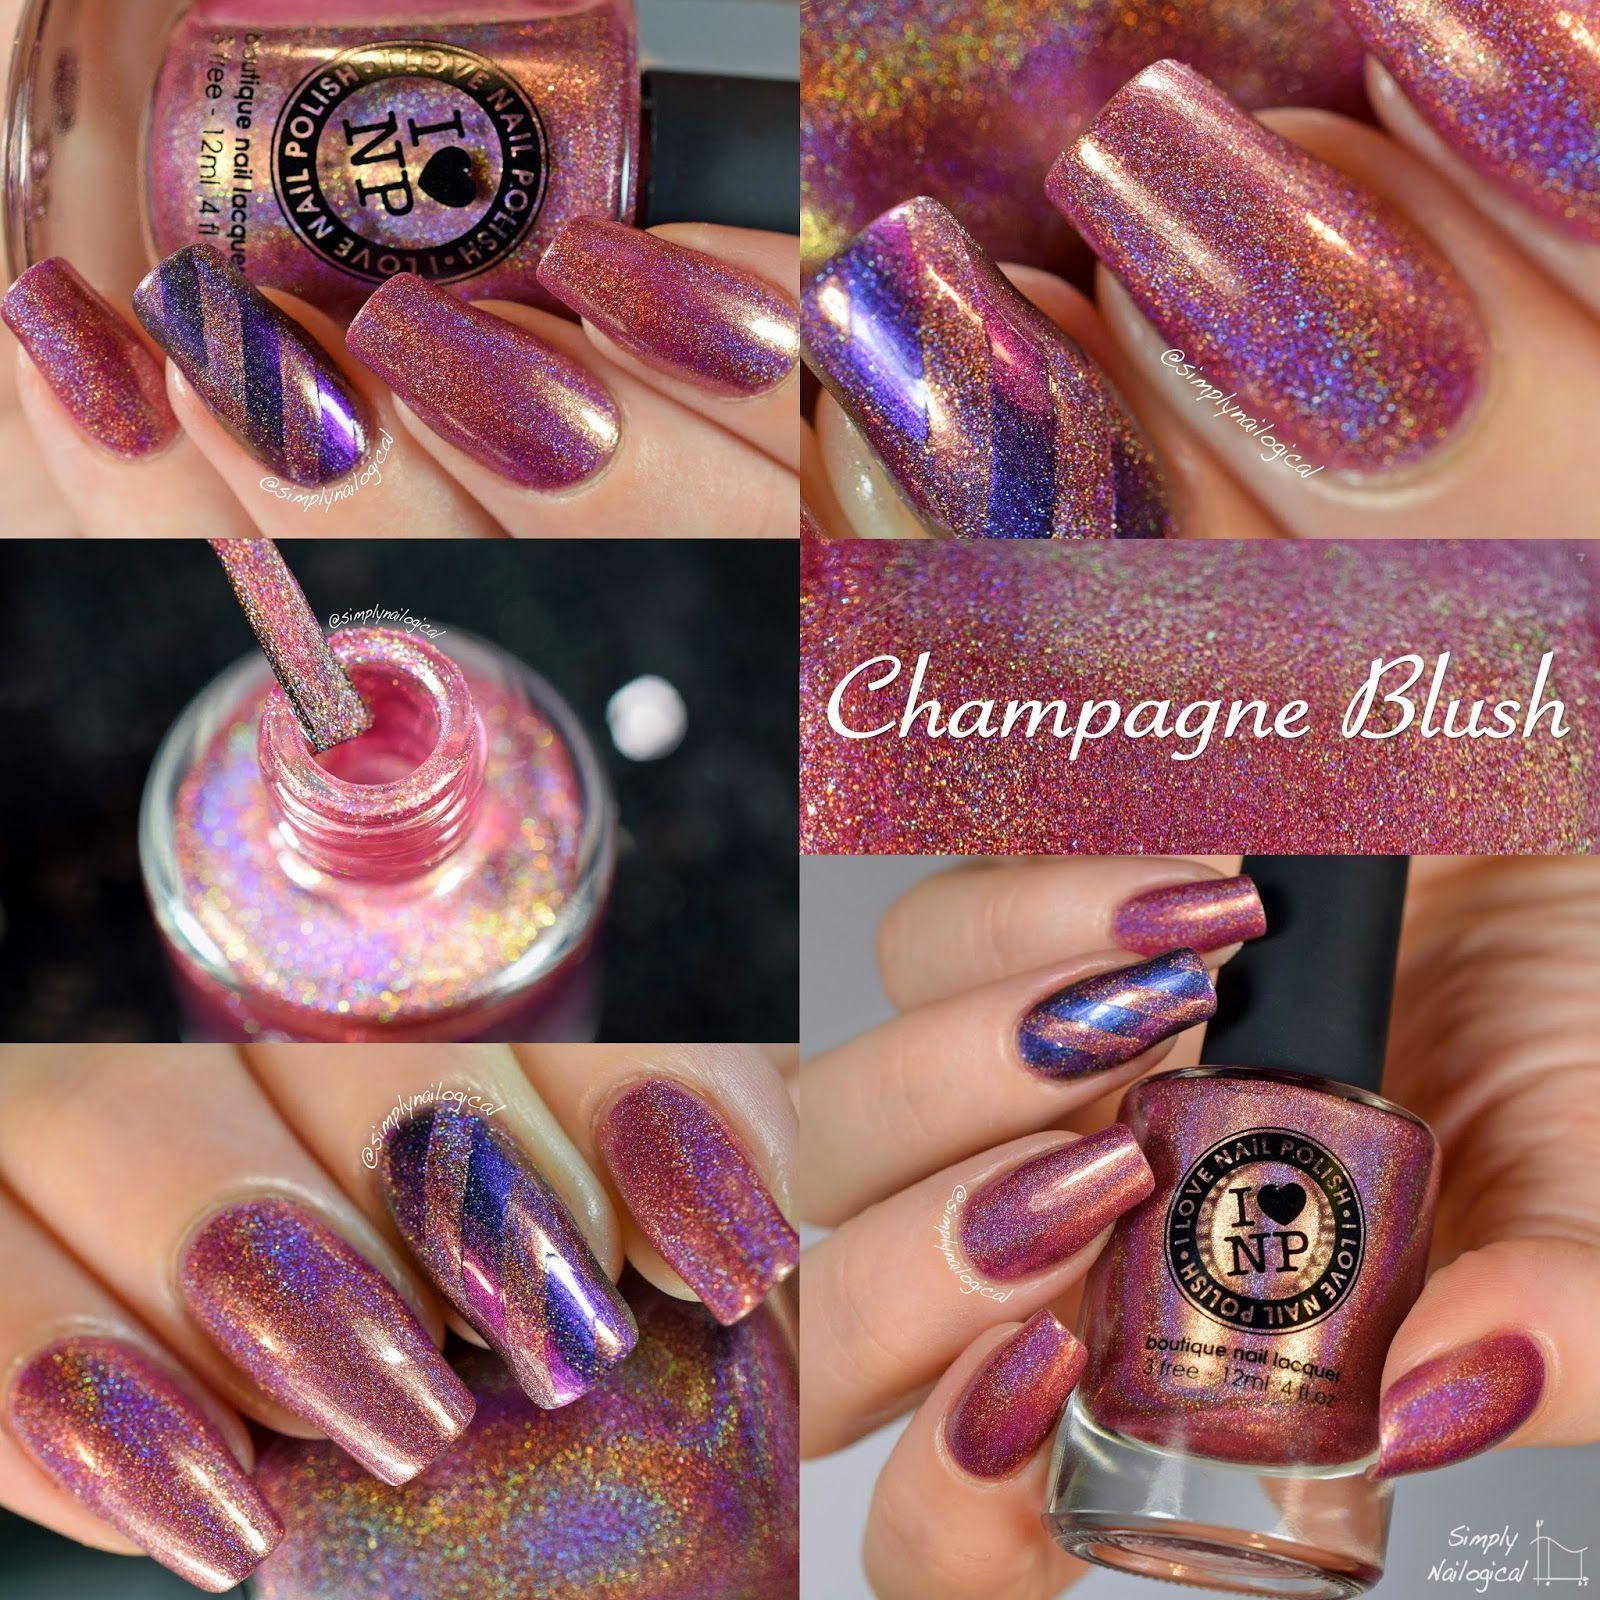 I Love Nail Polish (ILNP): Champagne Blush swatch